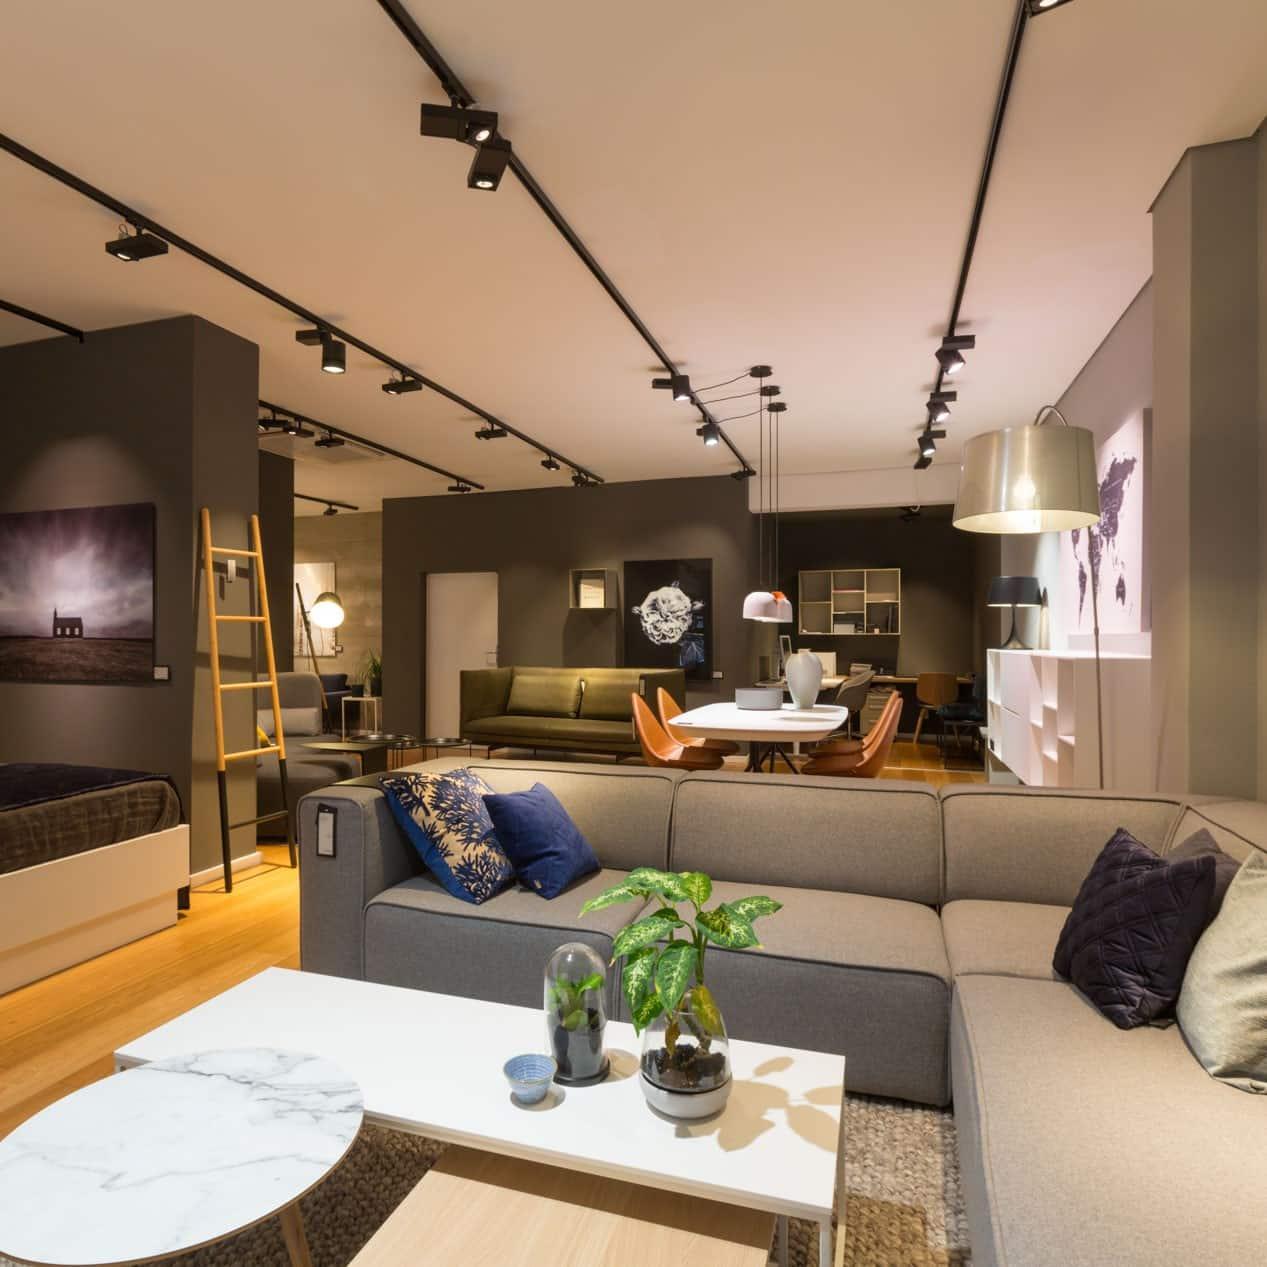 style hannover boconcept hannover 2 - BoConcept Hannover - dänisches Interieur-Design